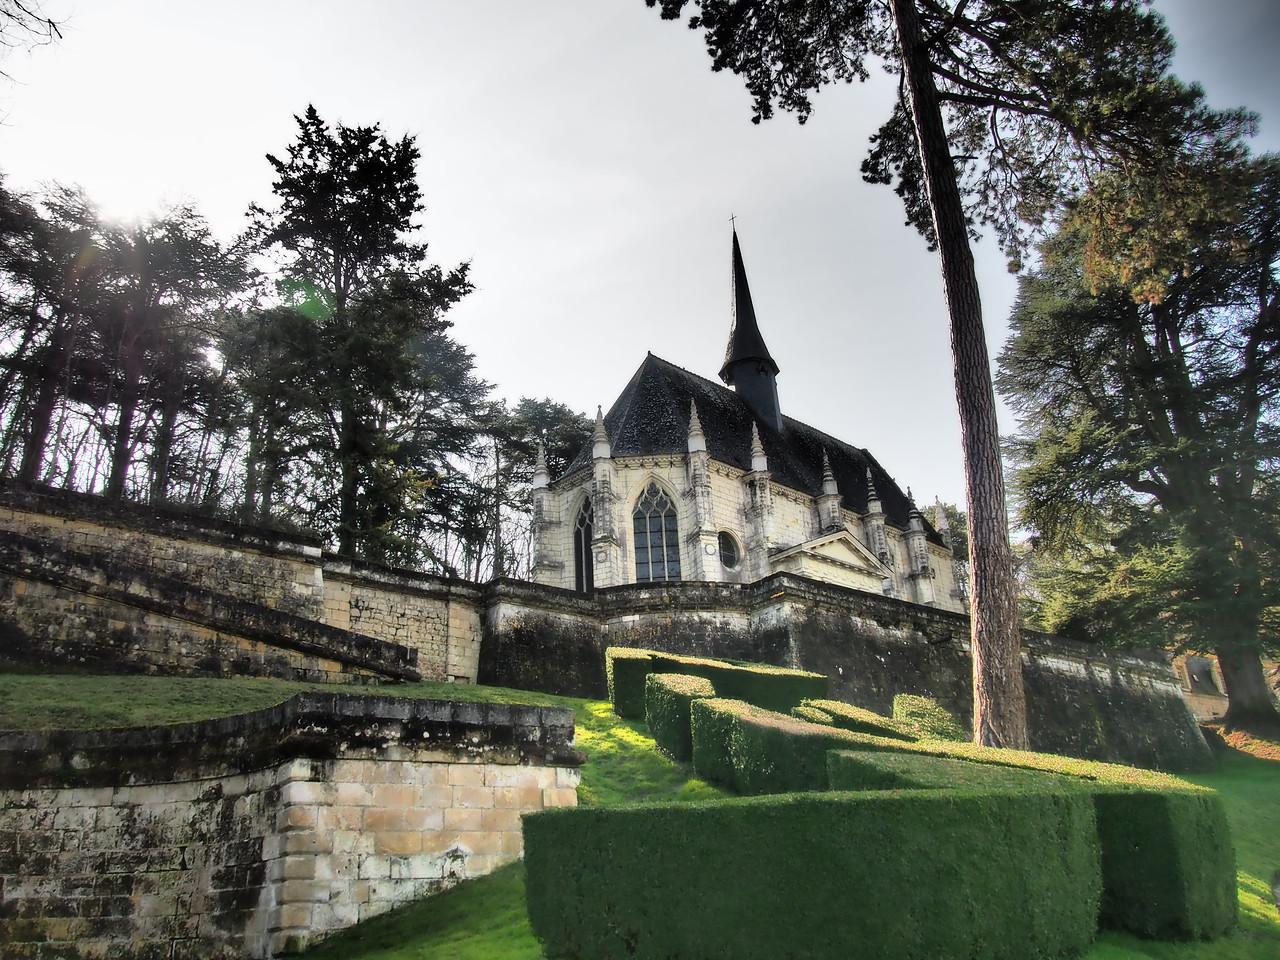 Chateau Ussa, France